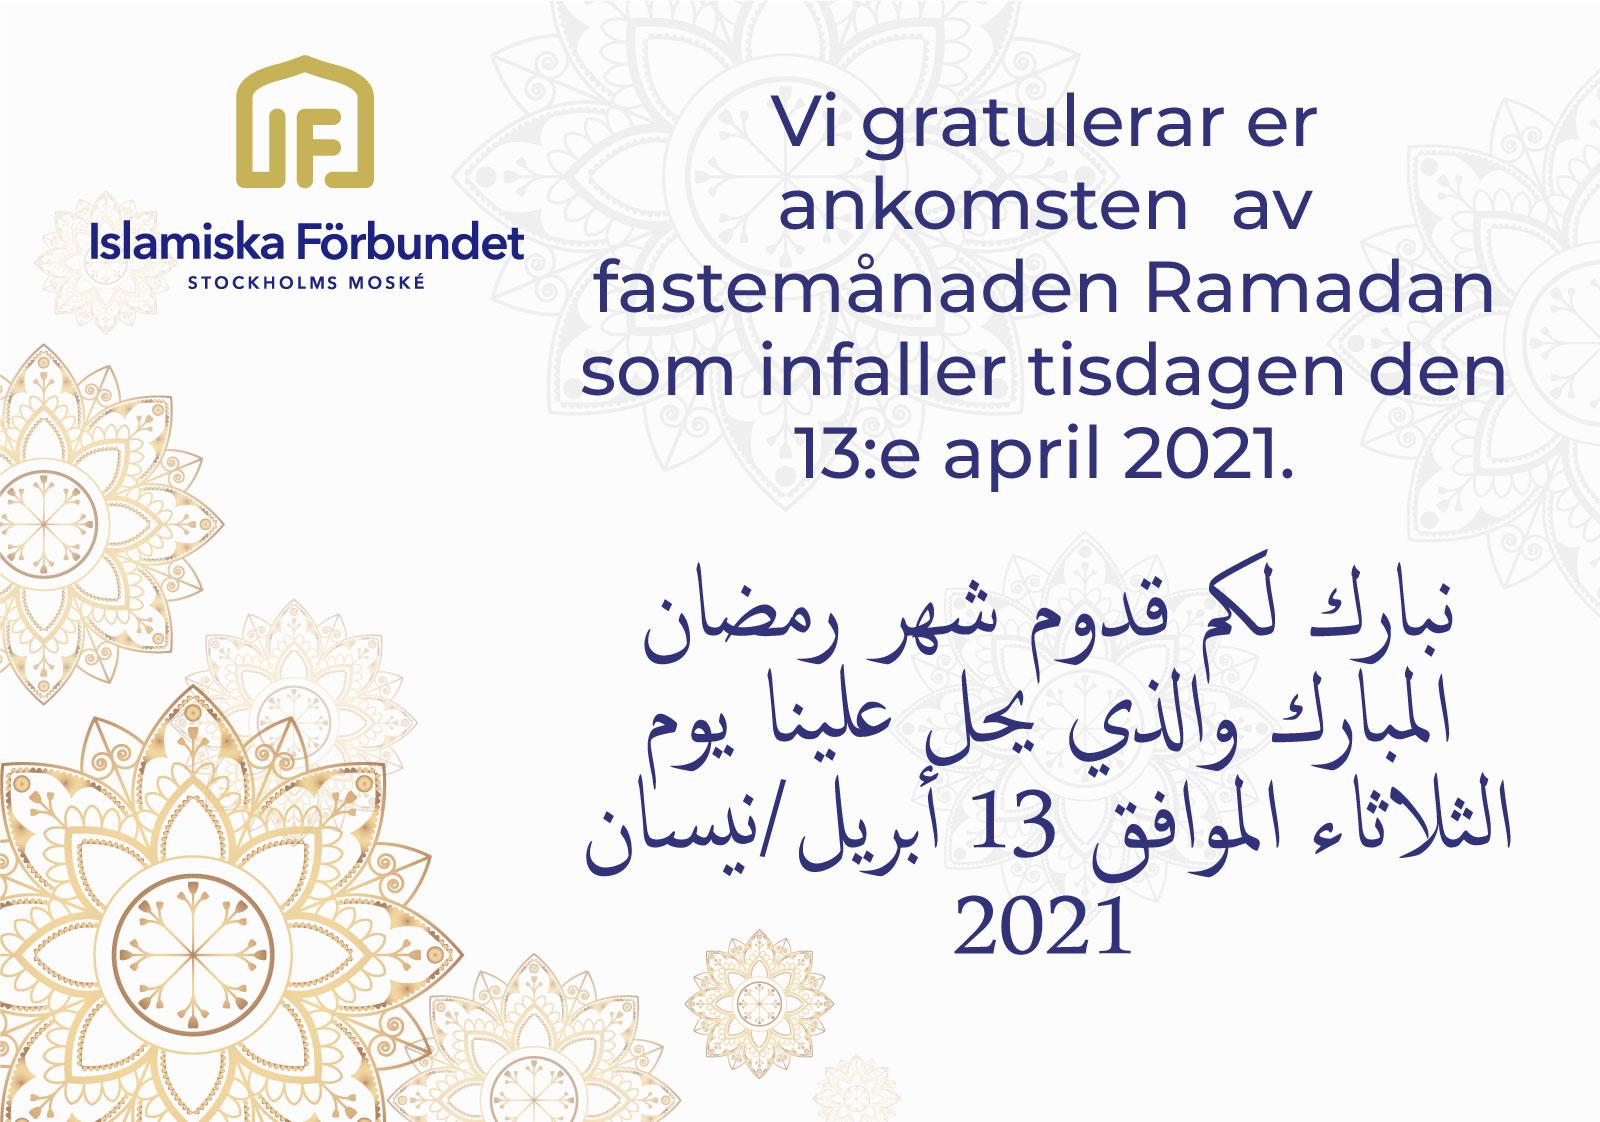 Ramadan 1442 hijri/2021 inleds tisdagen den 13:e april 2021